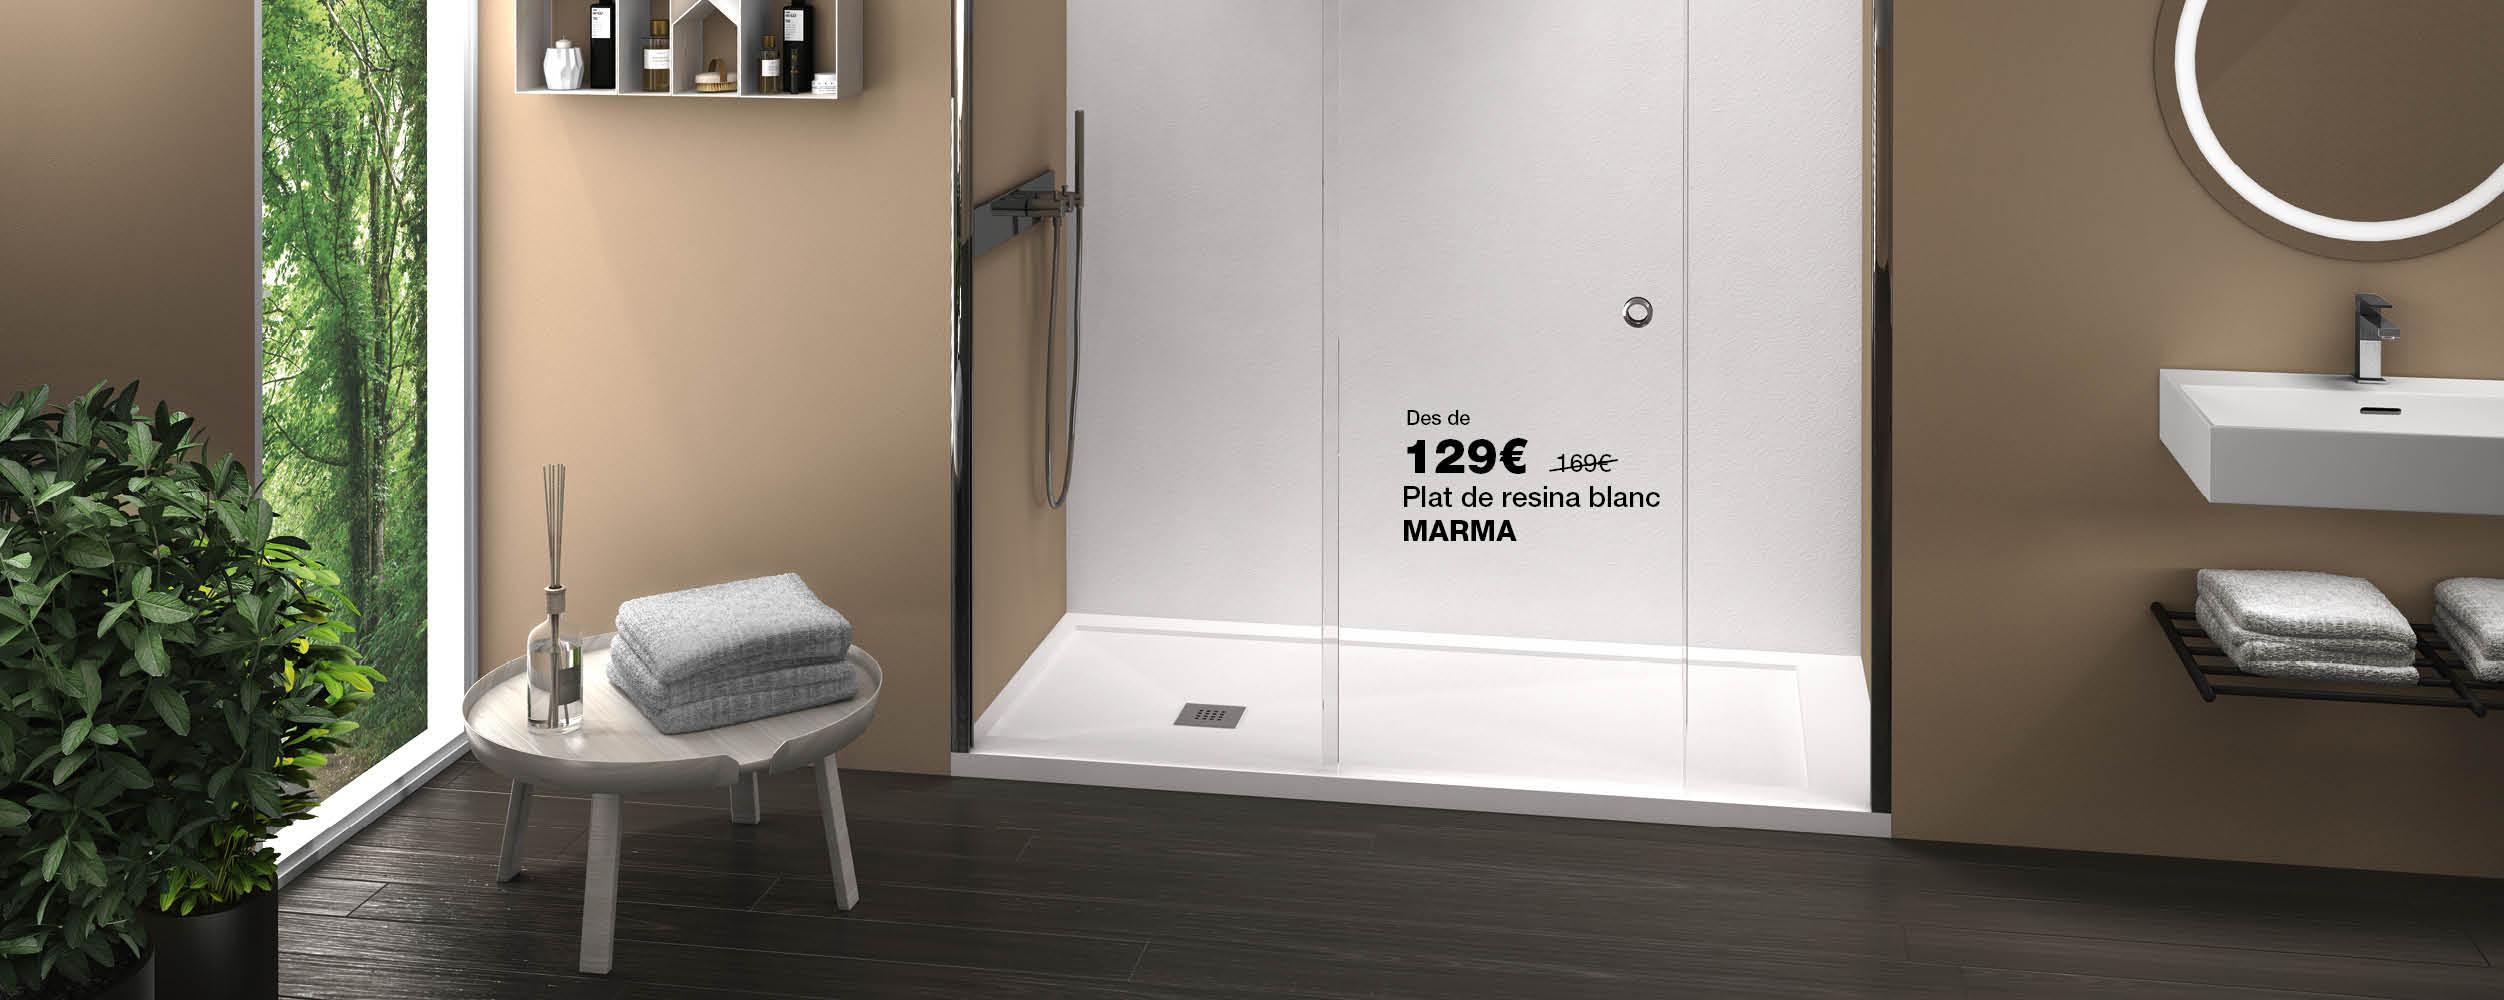 Plat de dutxa MARMA desde 129€